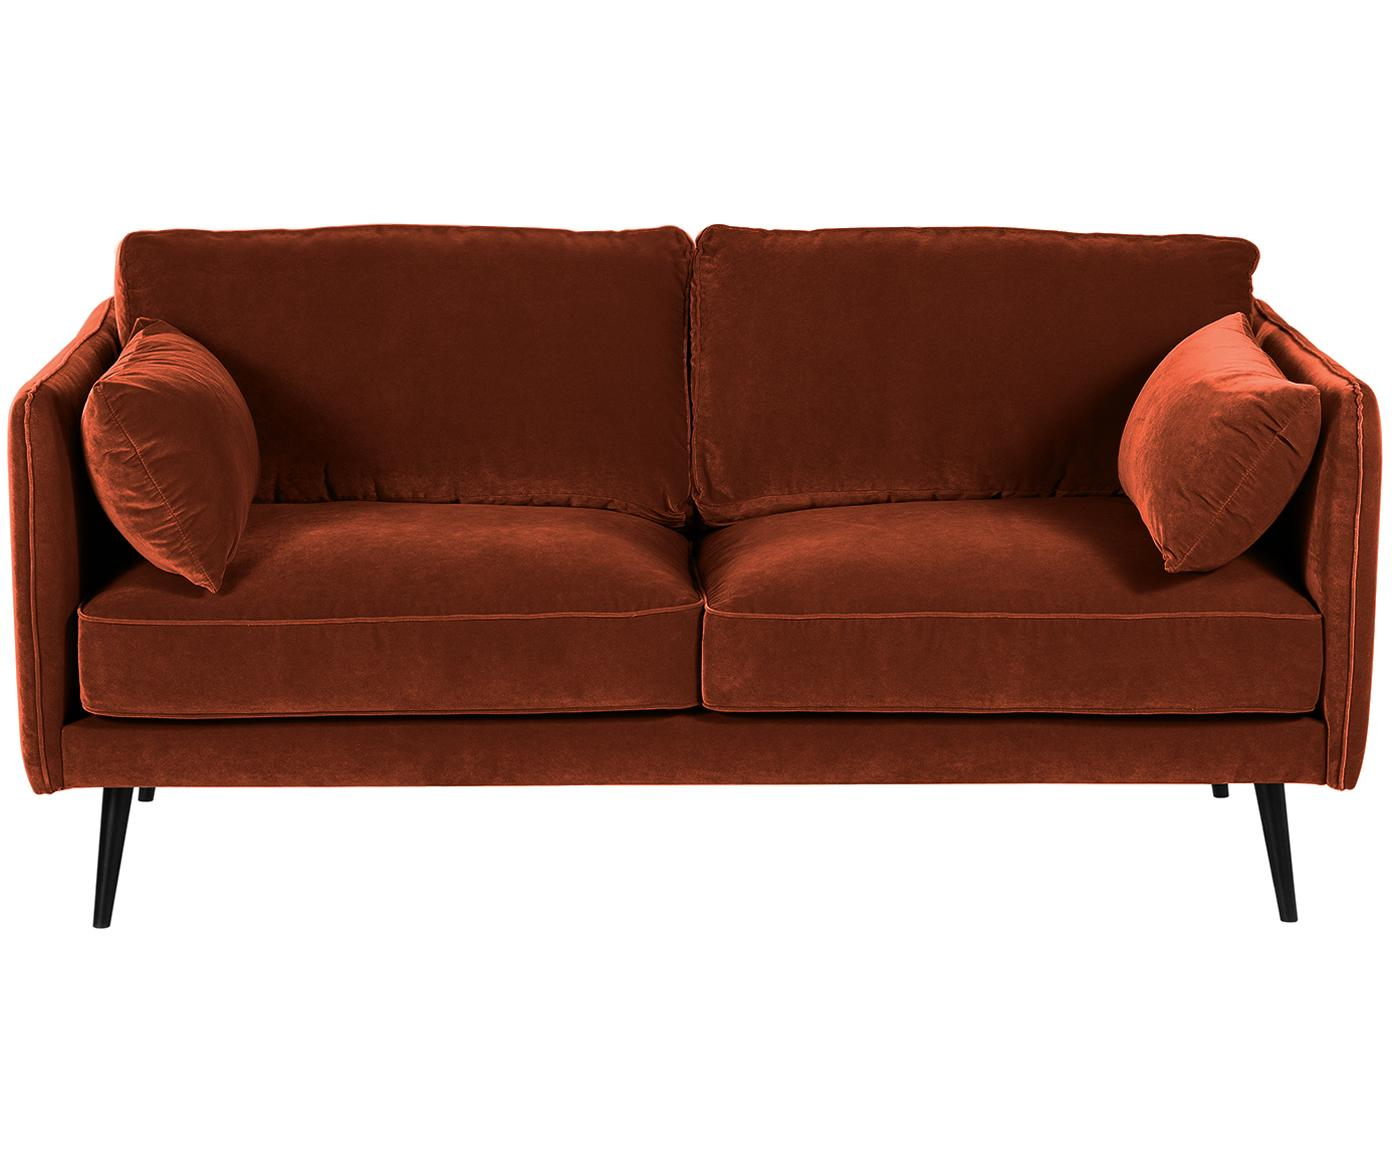 Samt-Sofa Paola (2-Sitzer), Bezug: Samt (Polyester) 70.000 S, Gestell: Massives Fichtenholz, Spa, Samt Rostrot, B 179 x T 95 cm